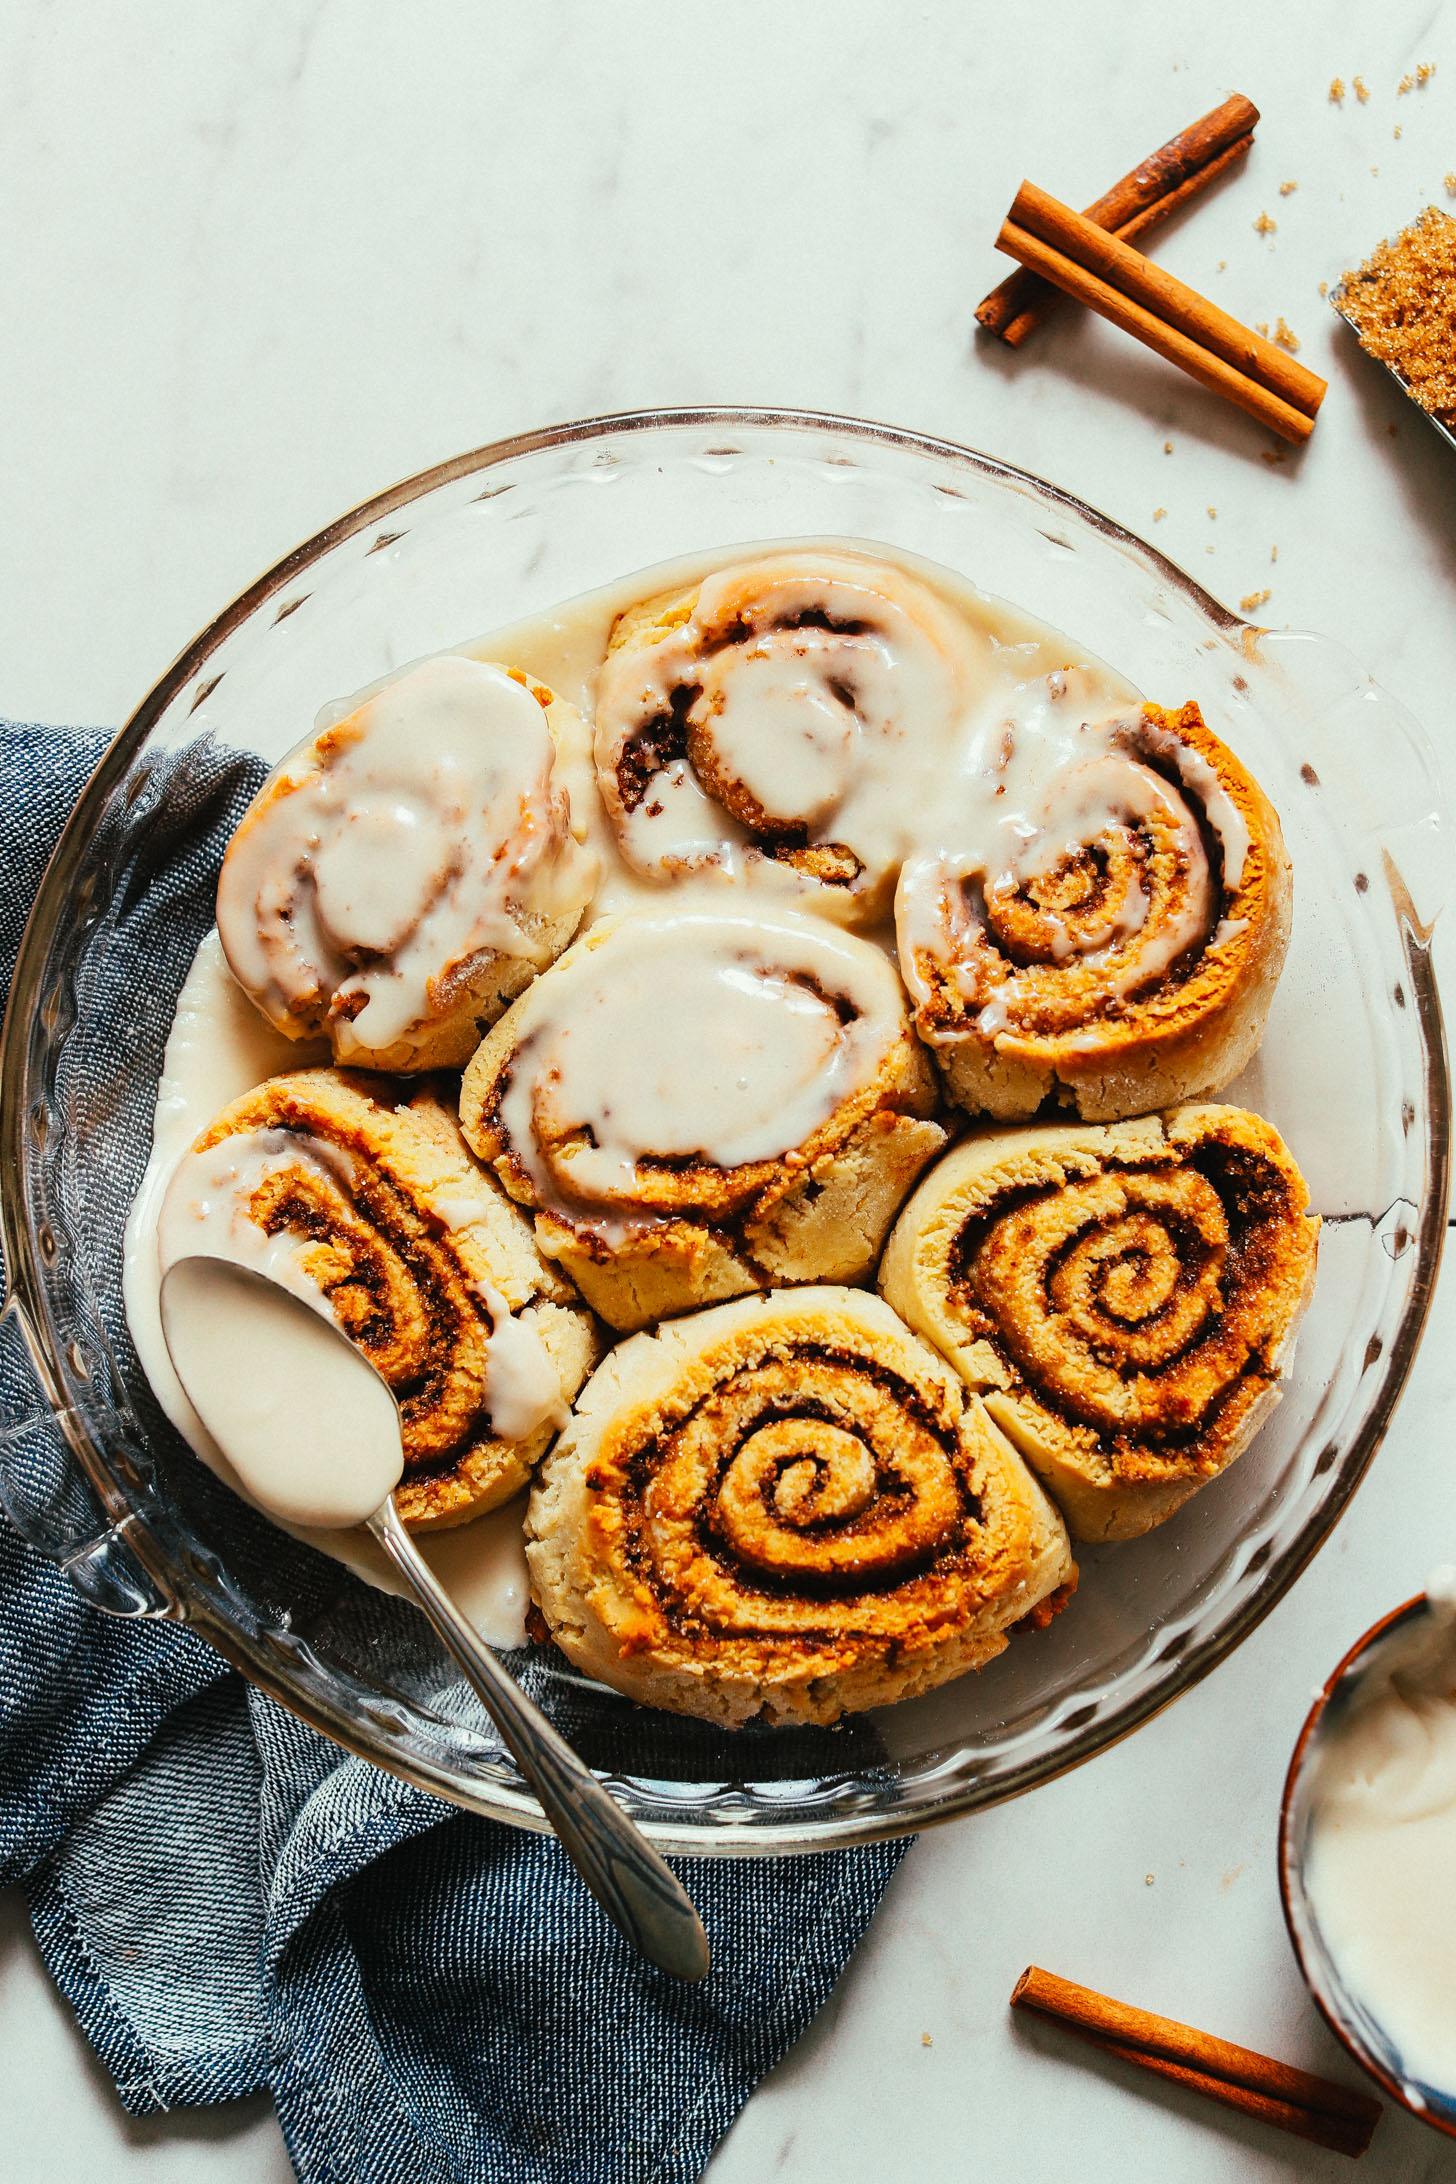 Pan Of Delicious Homemade Vegan Gluten Free Cinnamon Rolls